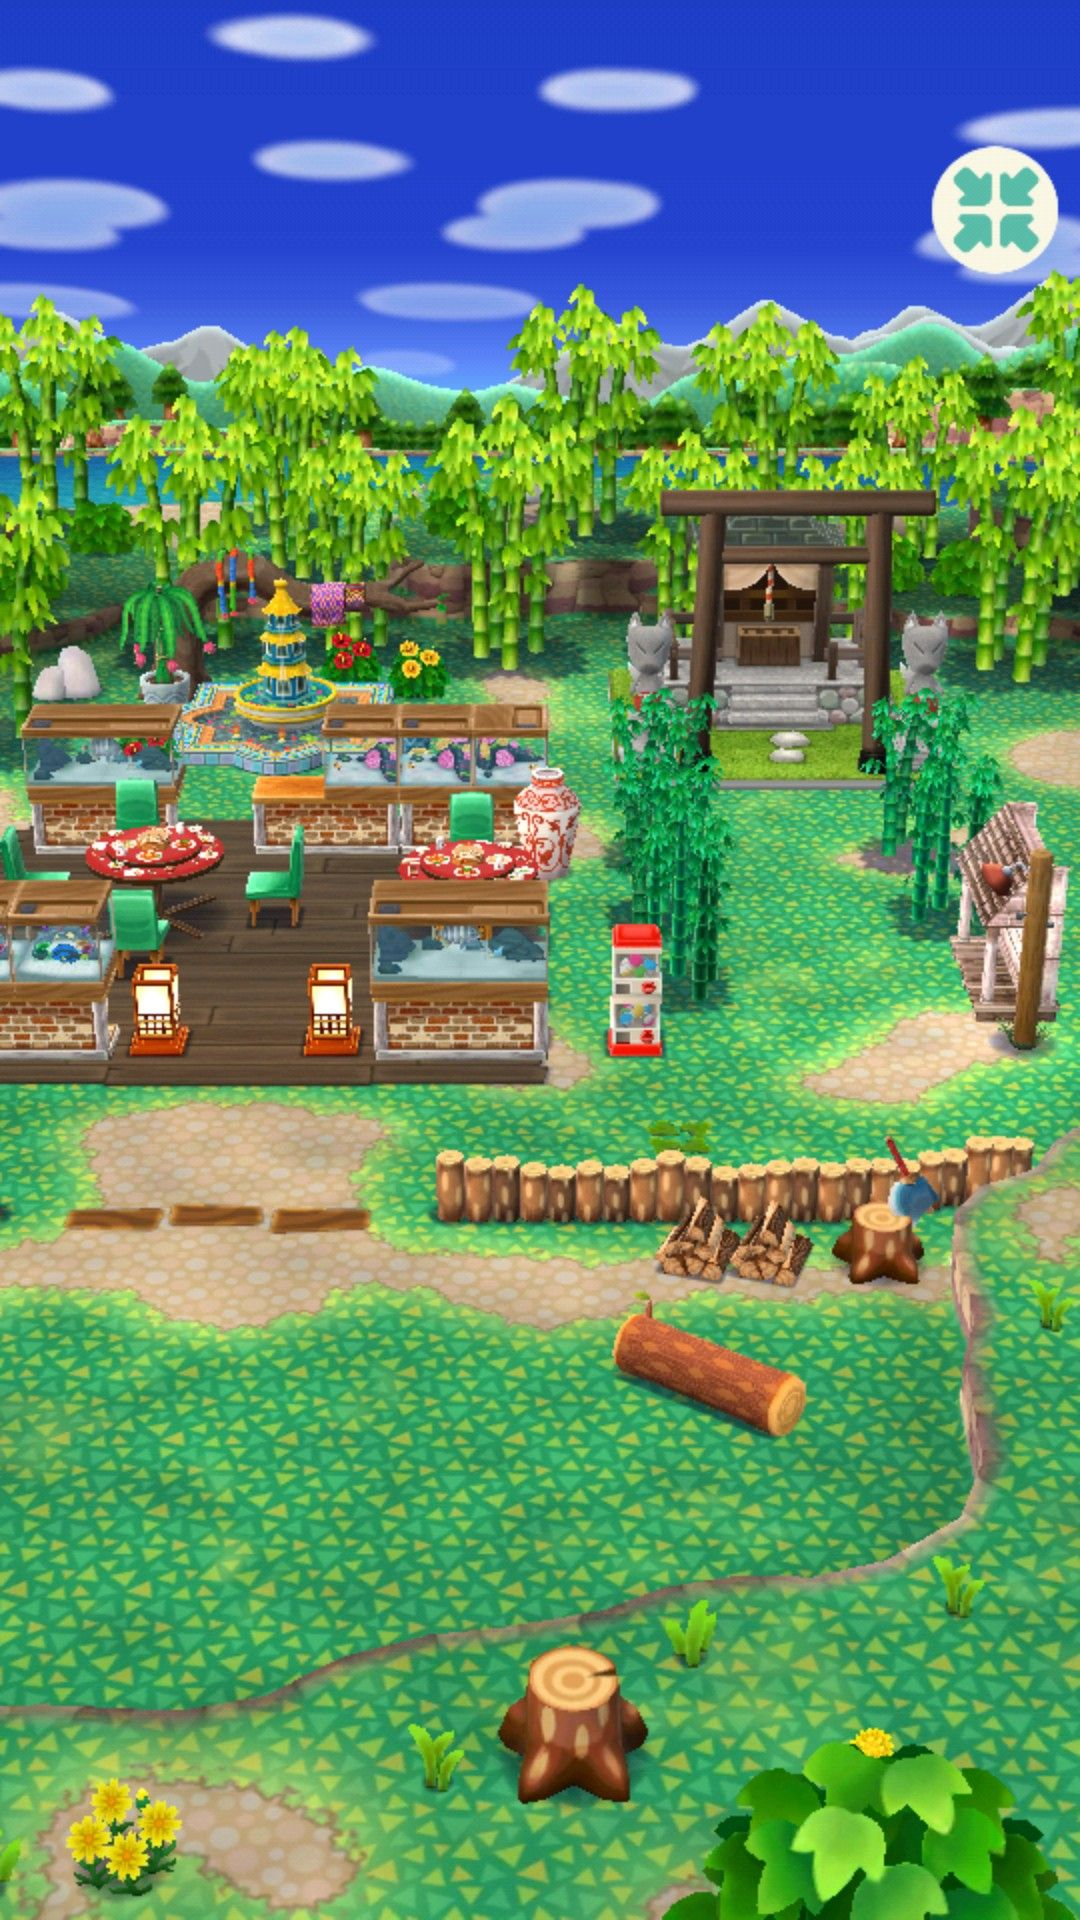 Animal Crossing Pocket Camp Restaurant 3.0 1/2 Animal